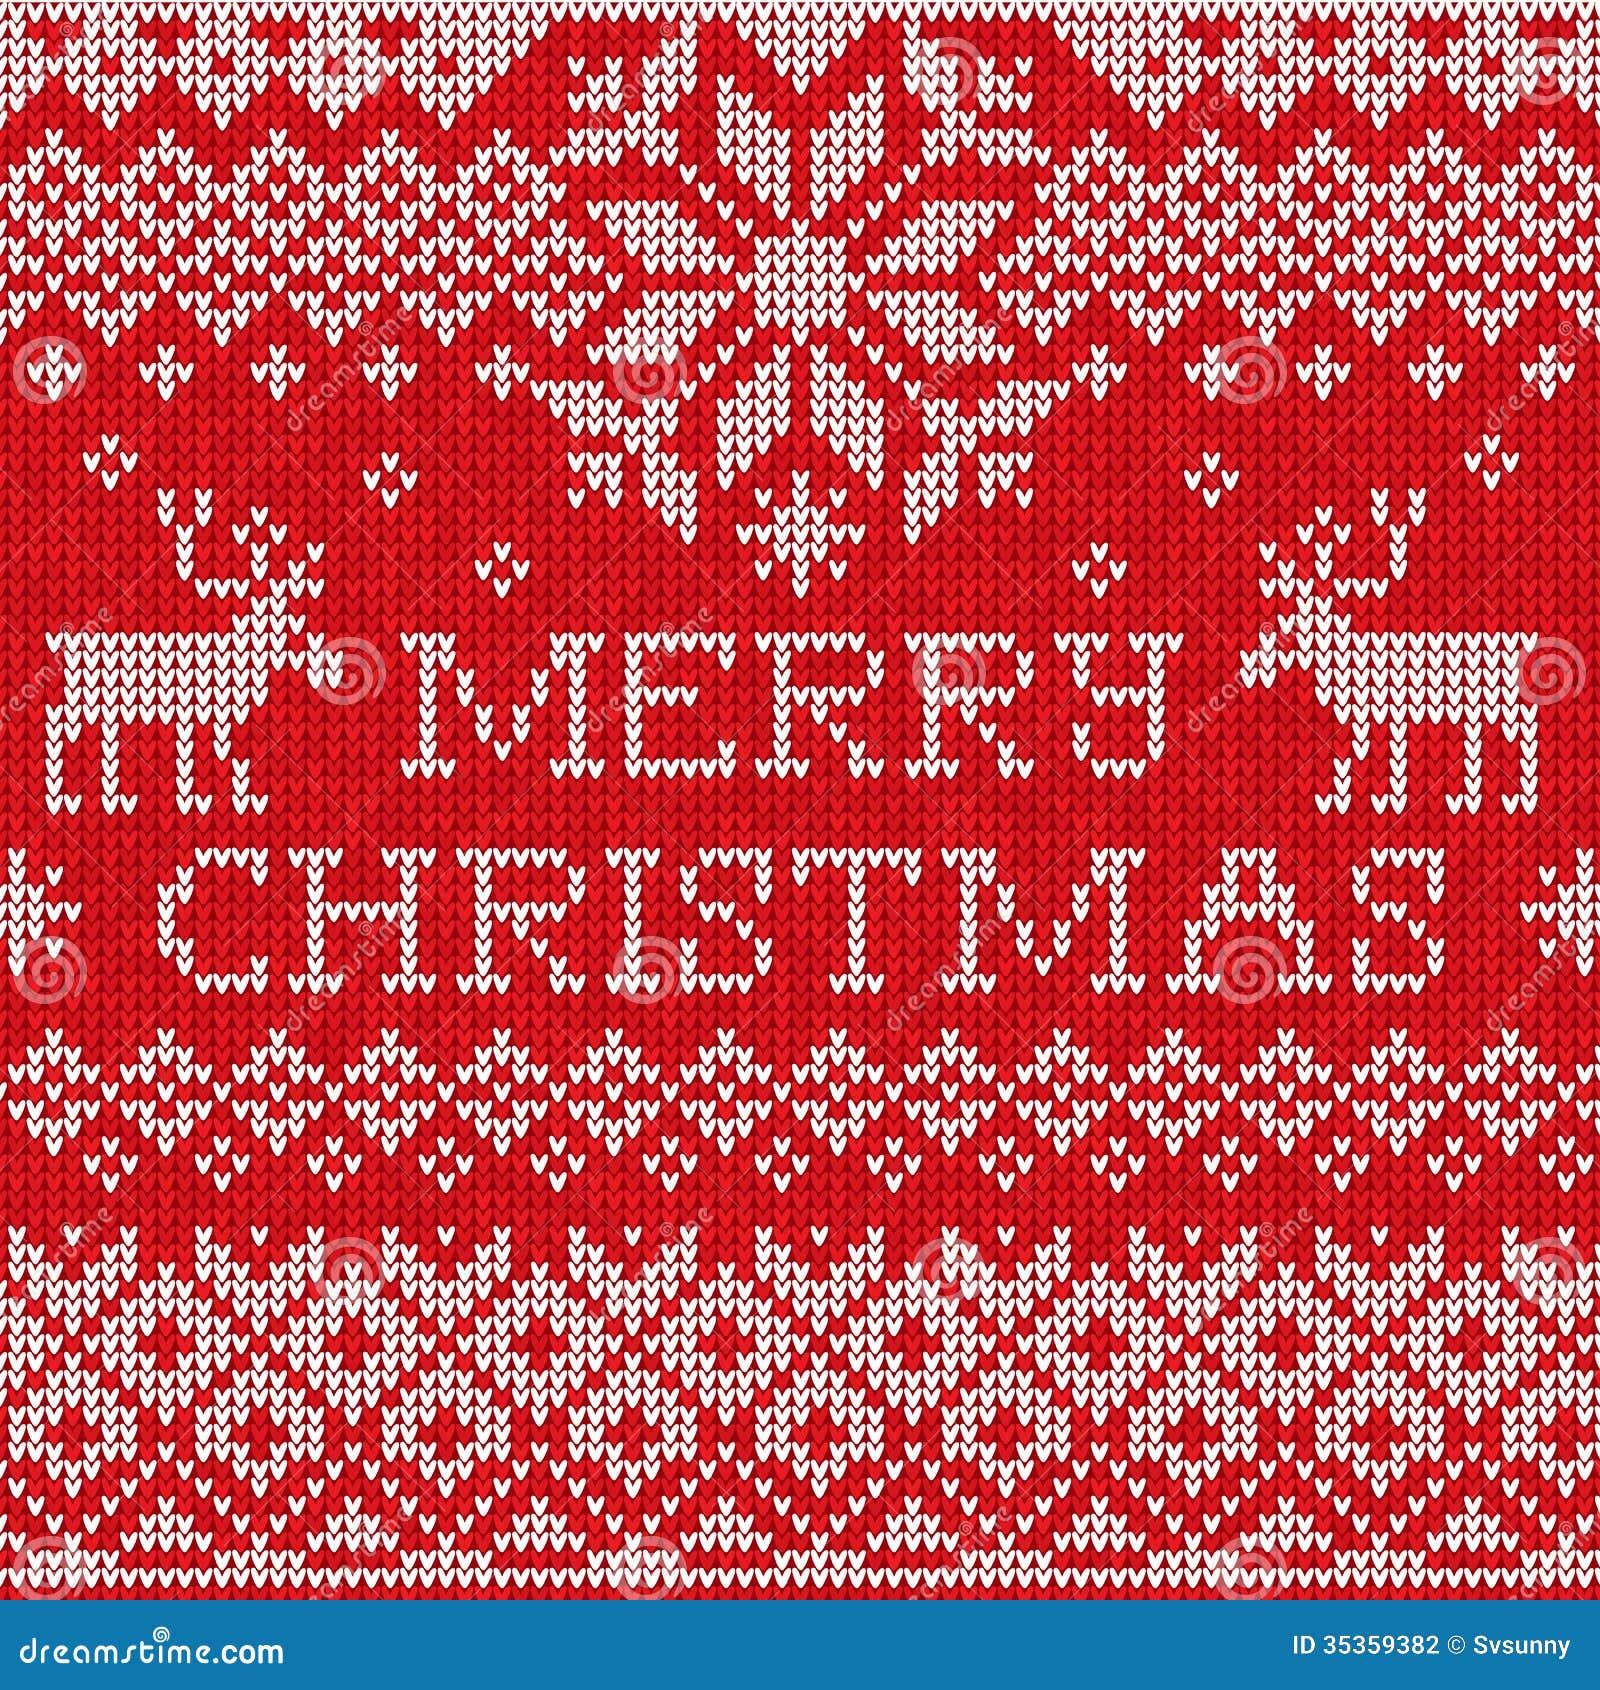 Merry Christmas: Scandinavian Style Seamless Knitted ...